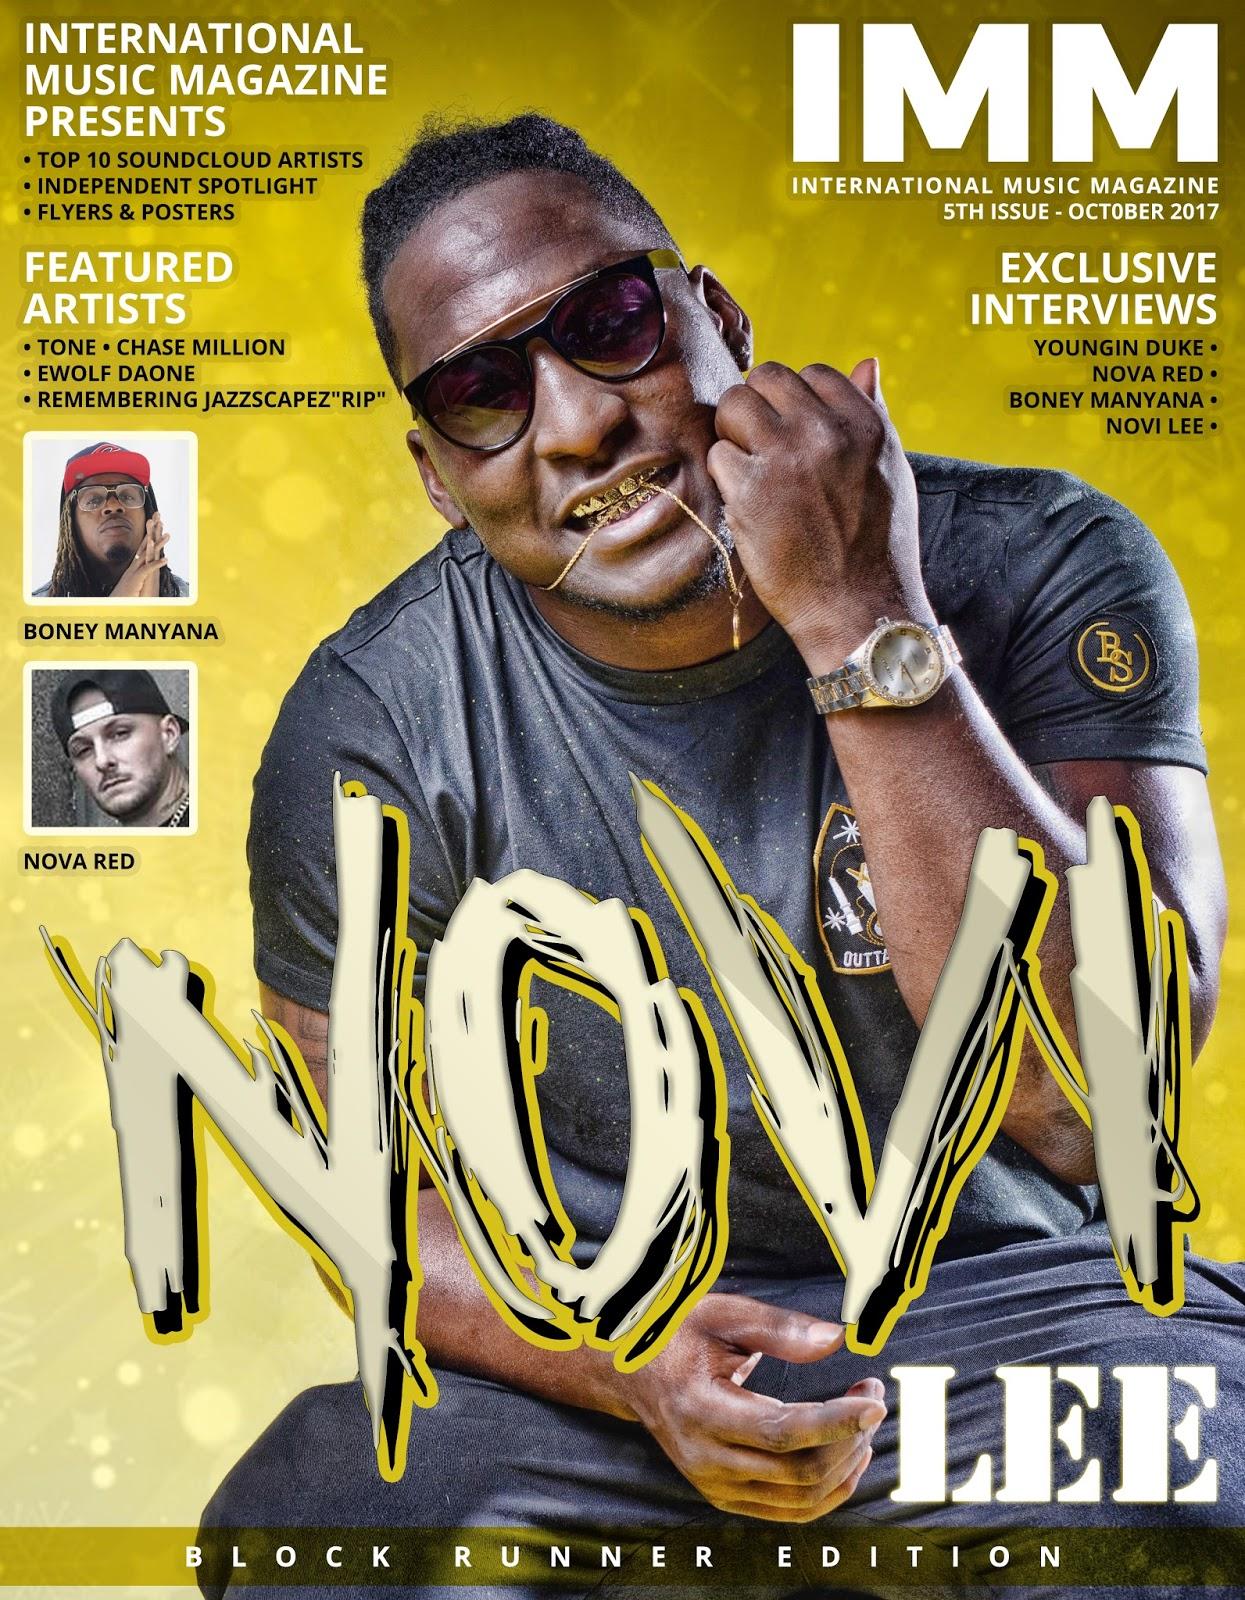 NOVI LEE | 5TH ISSUE